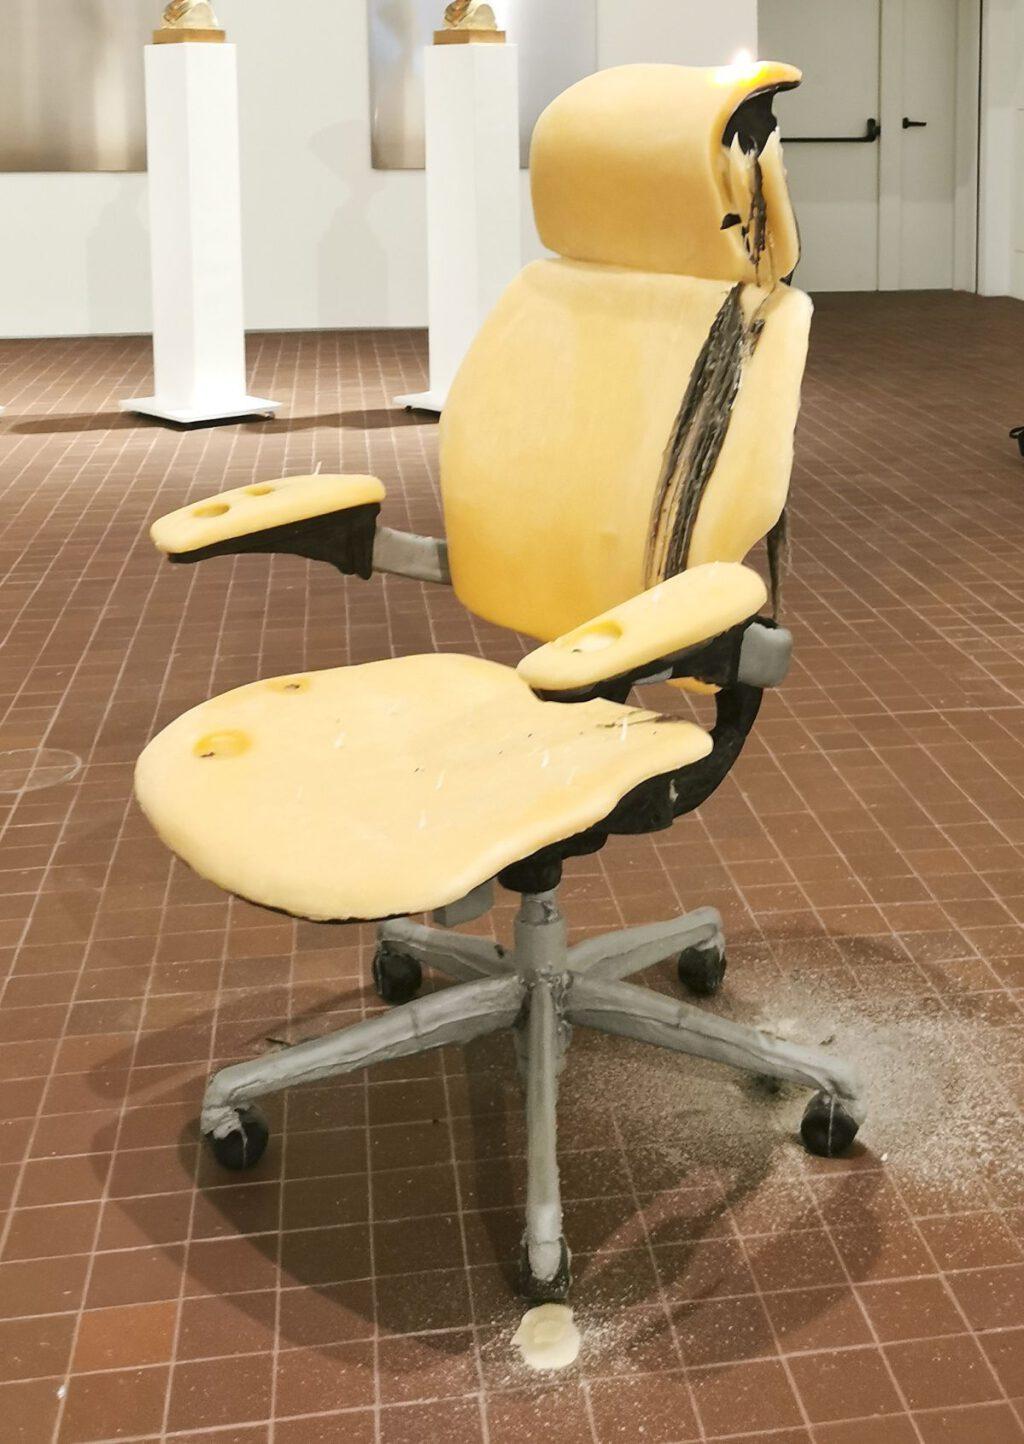 "Urs Fischer ""Untitled"" (2011) (The Rape of the Sabine Women) @ Collection Maja Hoffmann, LUMA Arles 2021 (chair)"